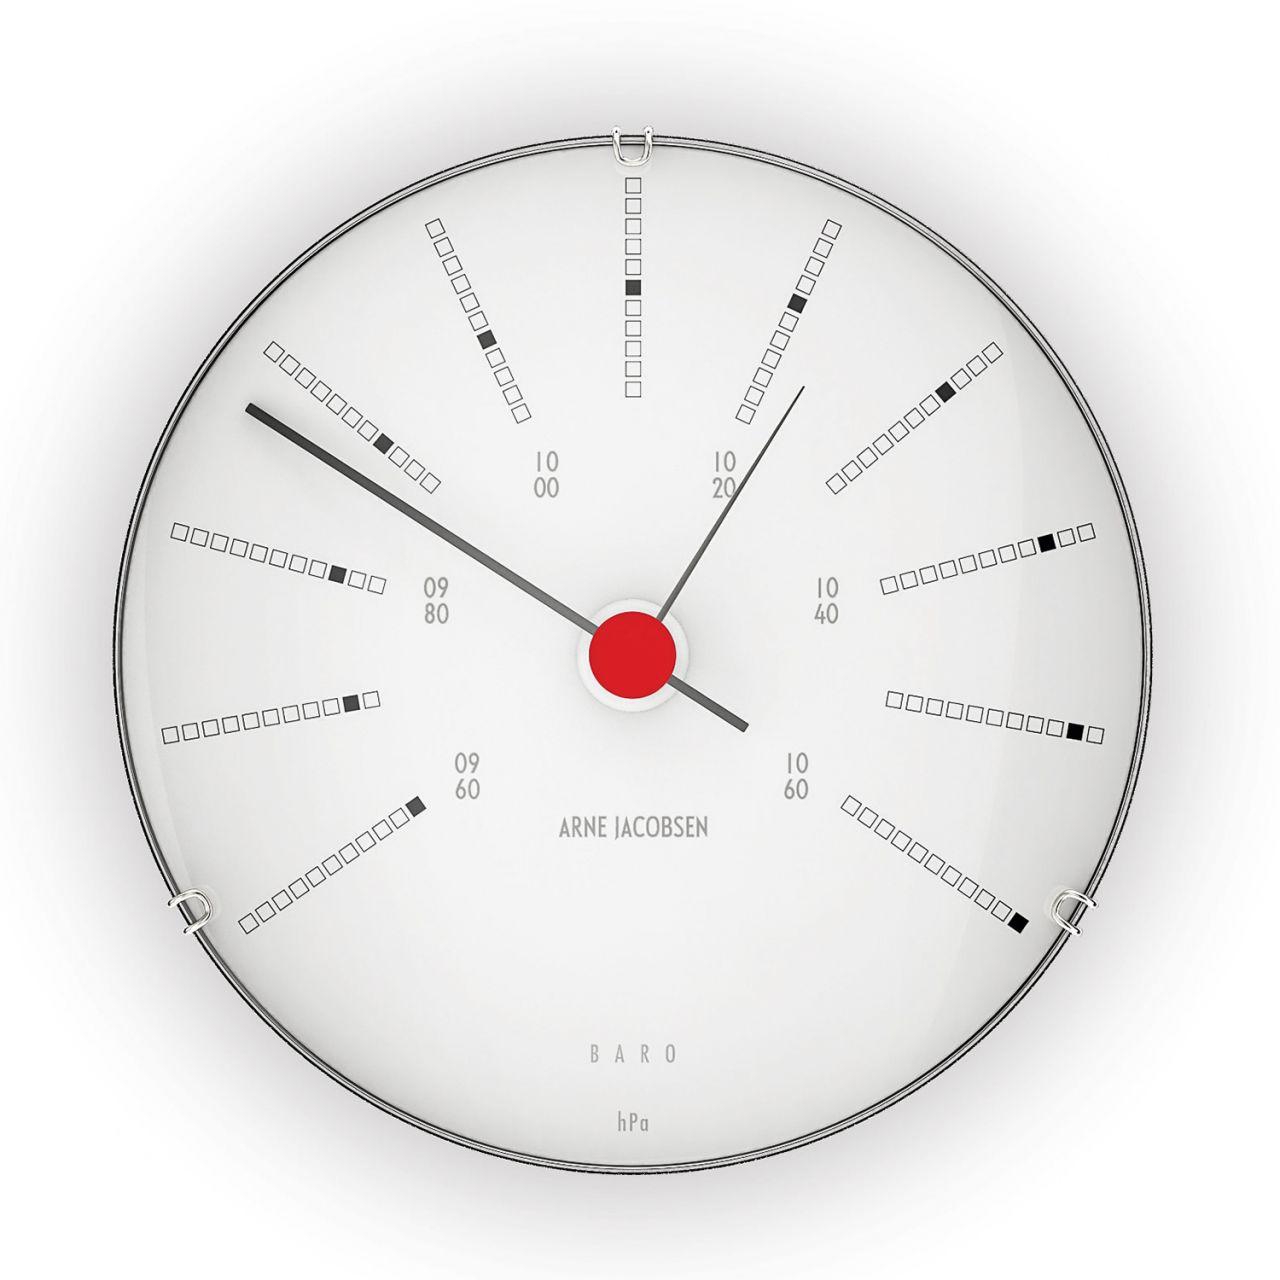 Arne Jacobsen - Bankers Barometer Wetterstation 43686